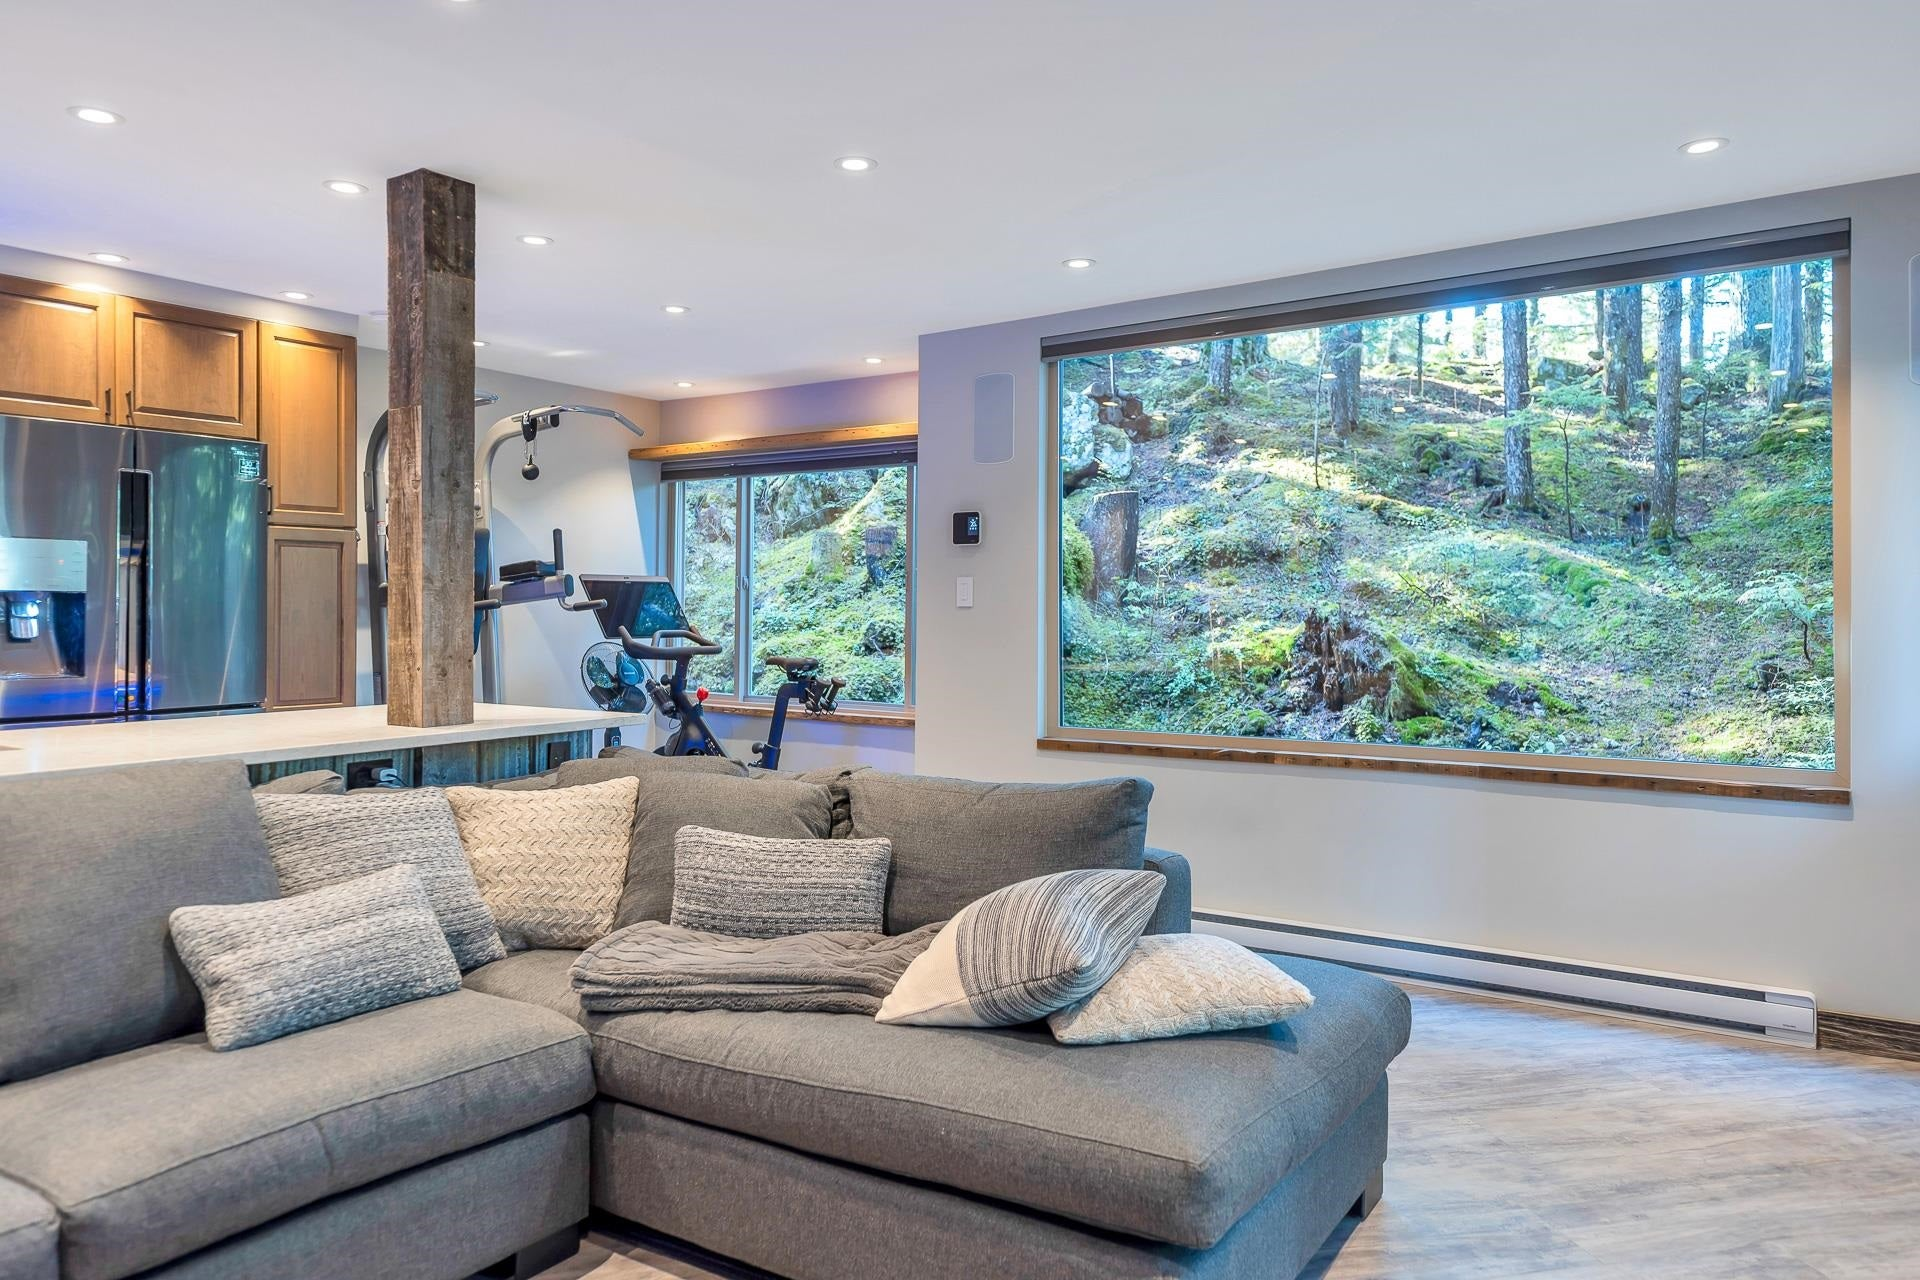 4 2201 EVA LAKE ROAD - Nordic Apartment/Condo for sale, 2 Bedrooms (R2626169)